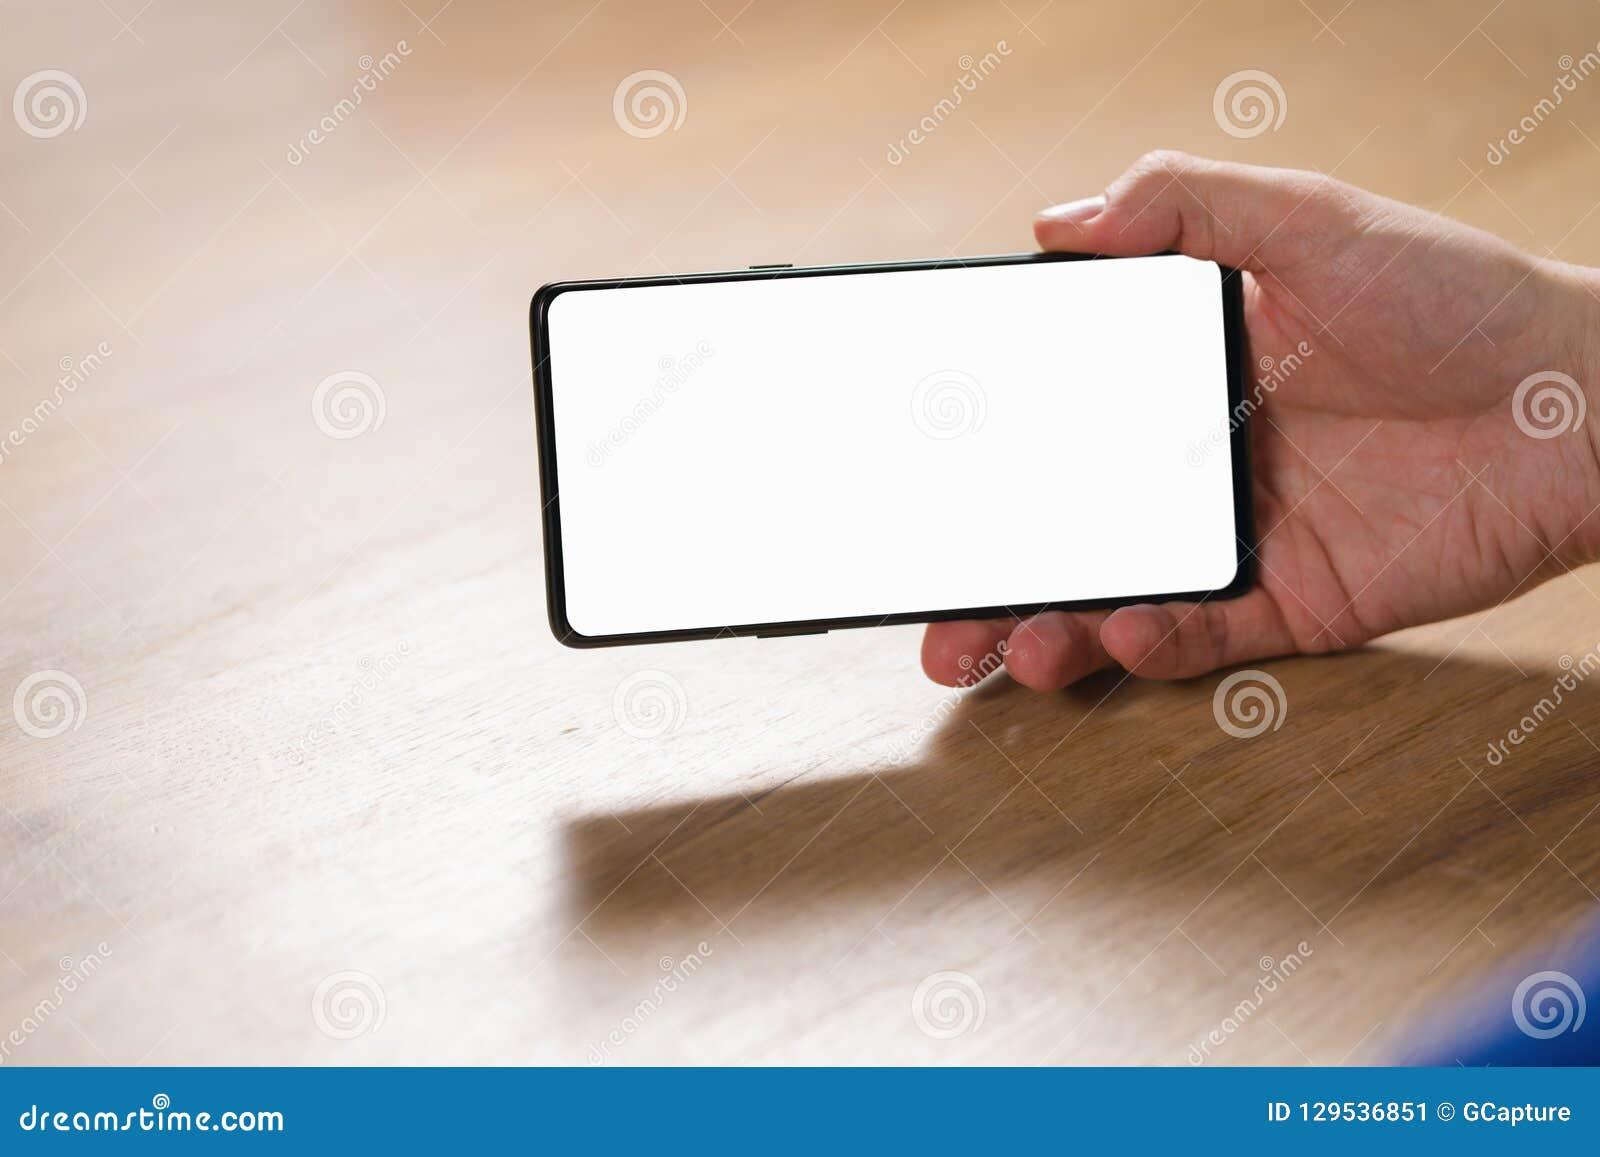 Smartphone εκμετάλλευσης χεριών νεαρών άνδρων με την κενή άσπρη οθόνη στον τρόπο τοπίων